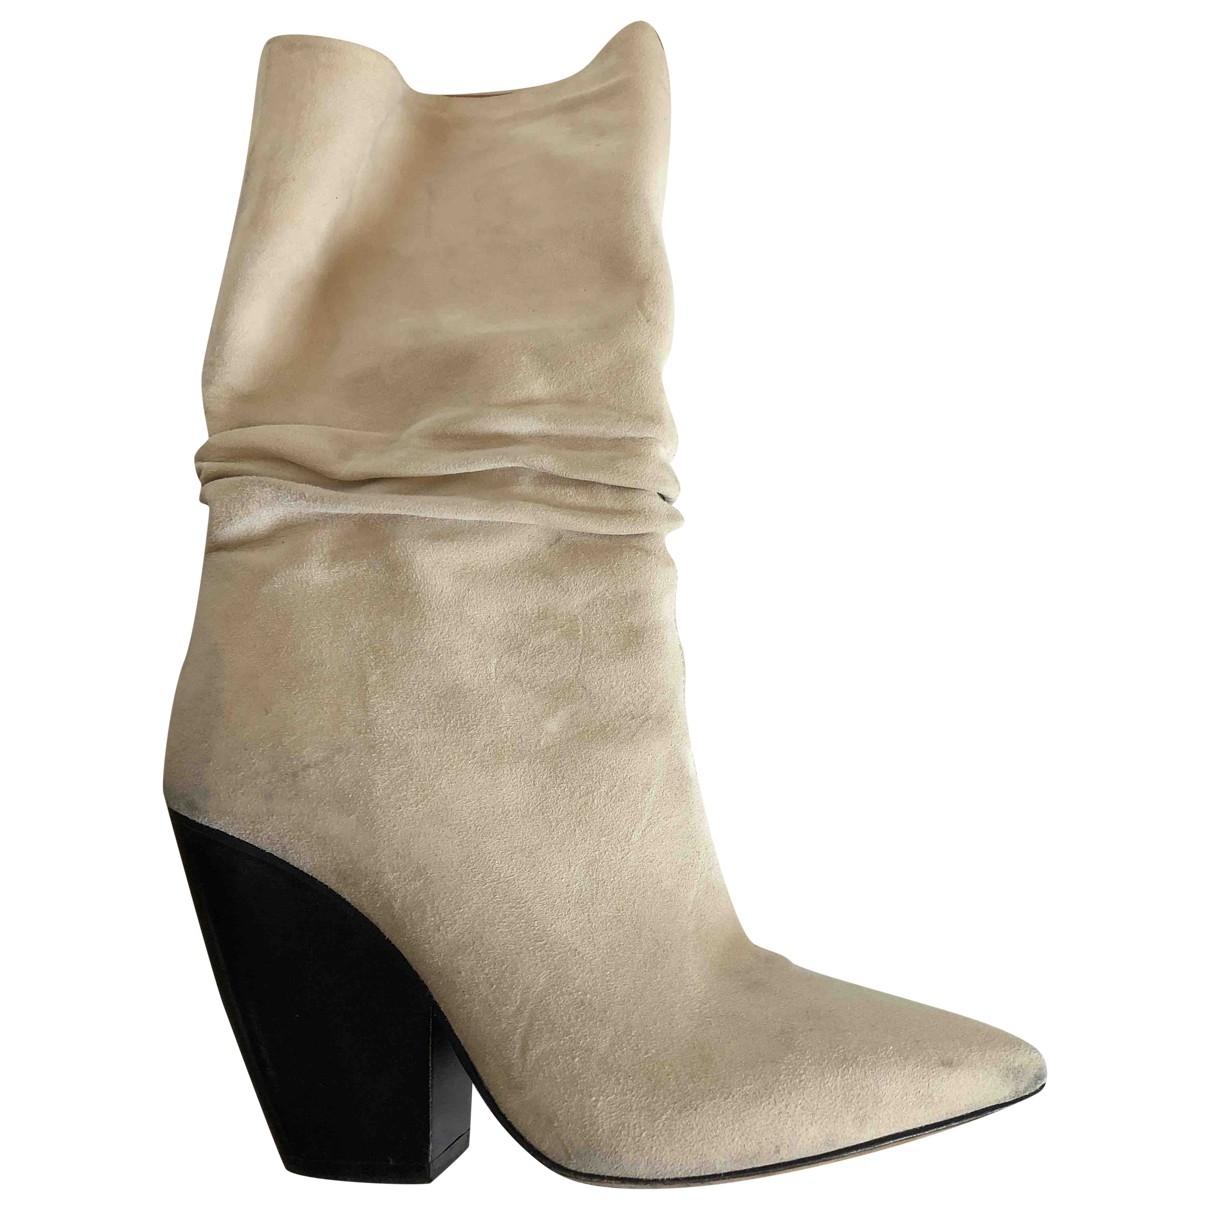 Iro Spring Summer 2019 Beige Suede Boots for Women 37 EU